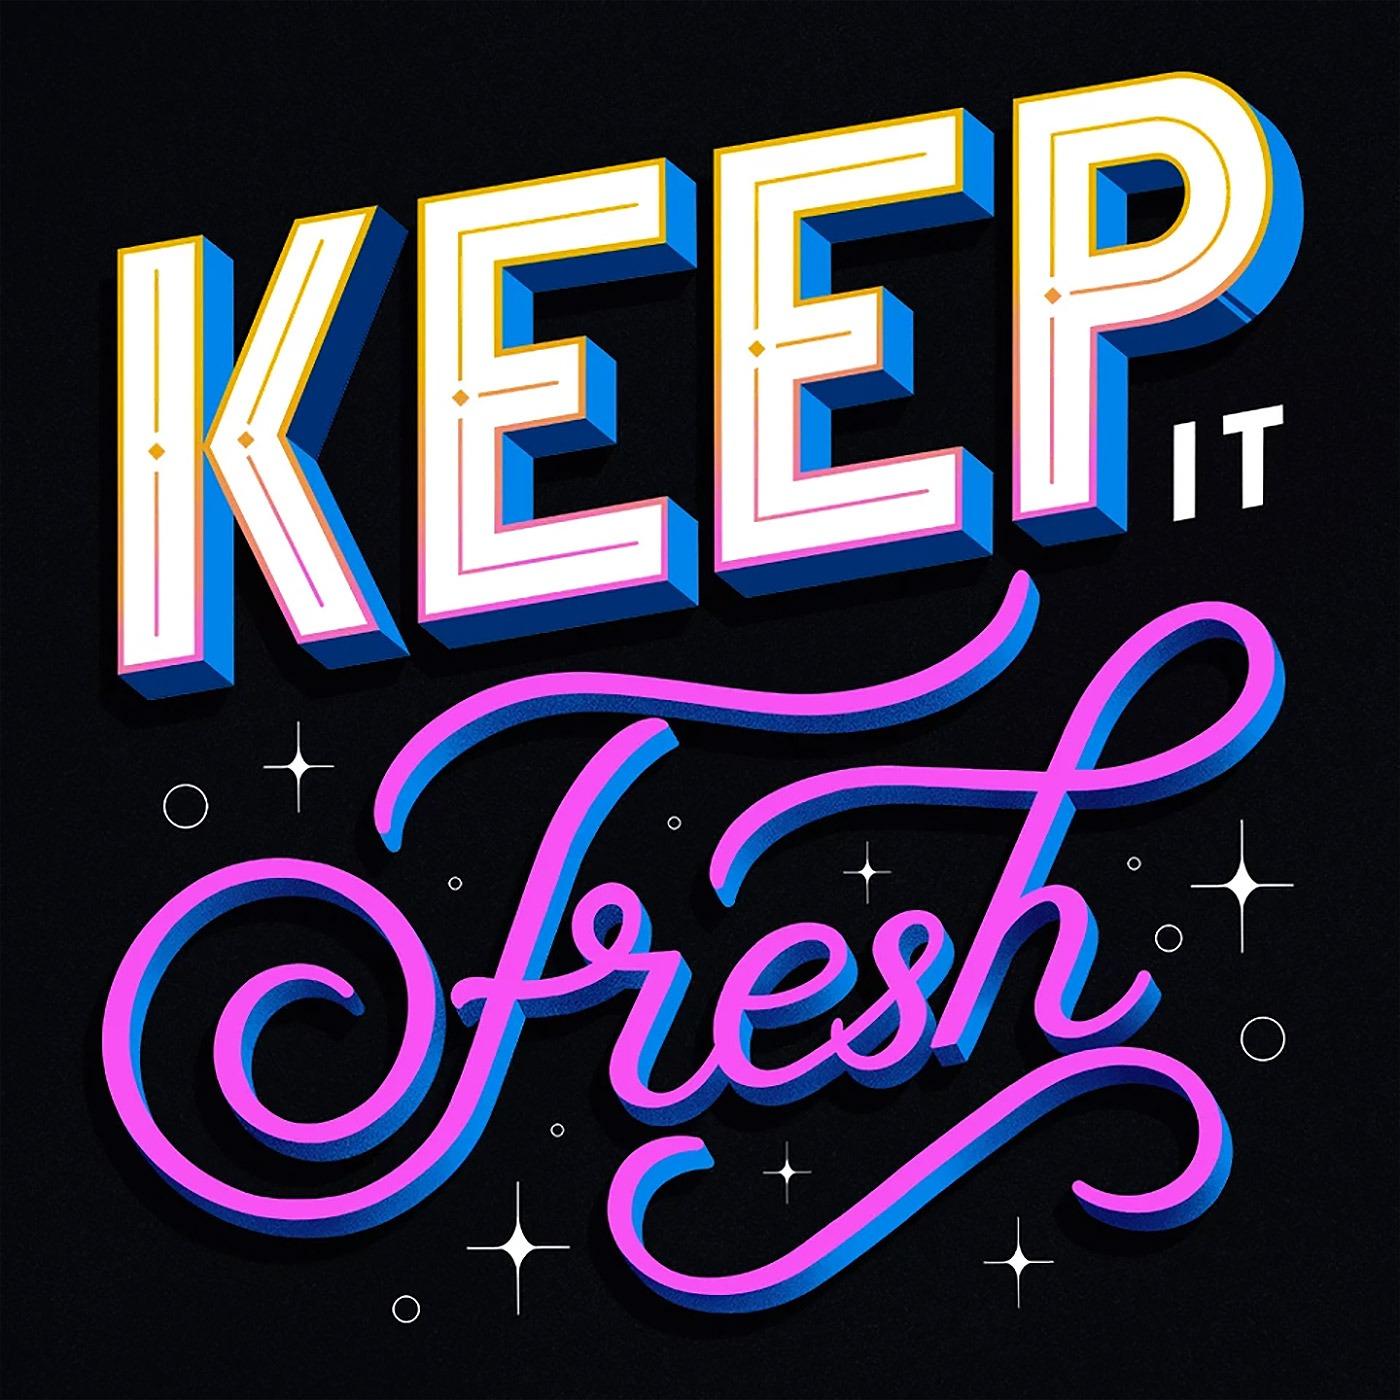 Ashley Janson创意立体感字体设计